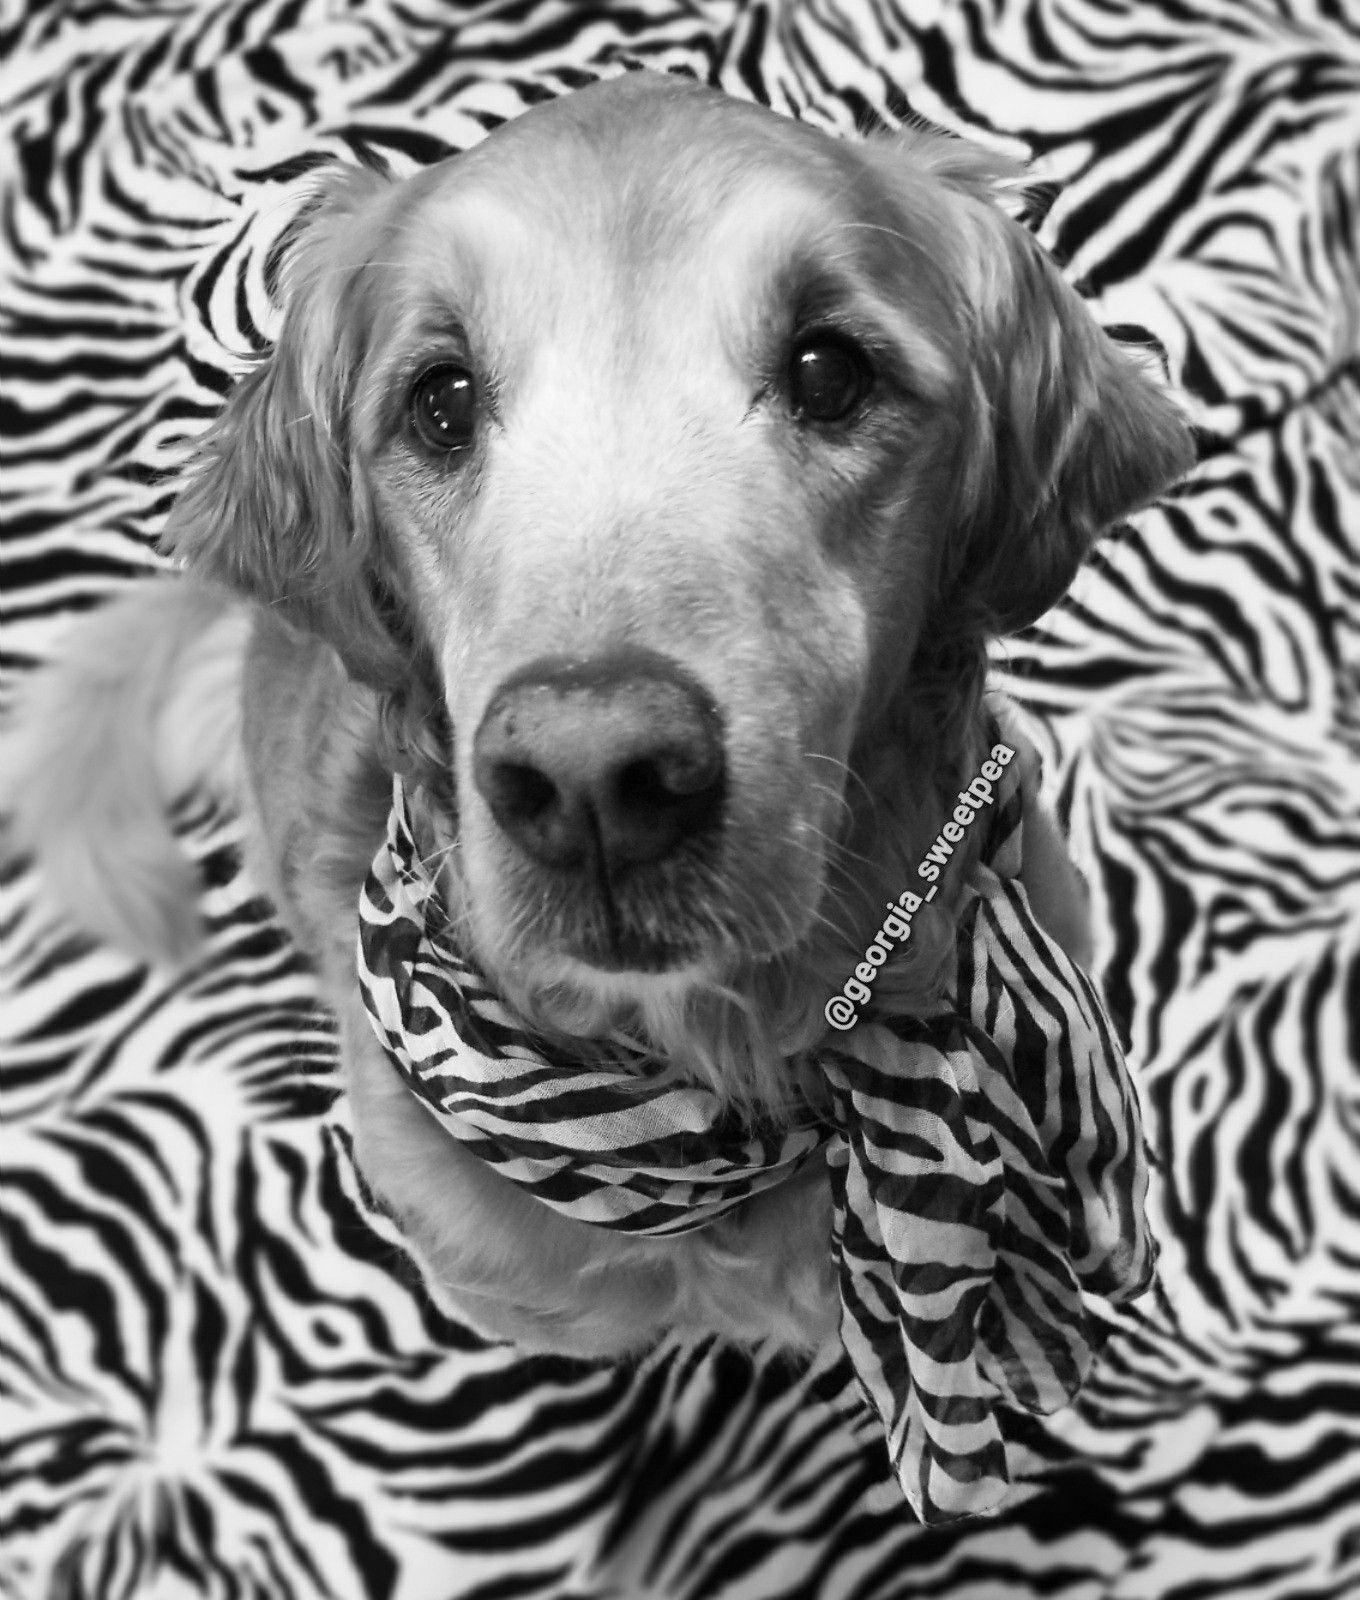 Fashionable dog Follow me on Instagram